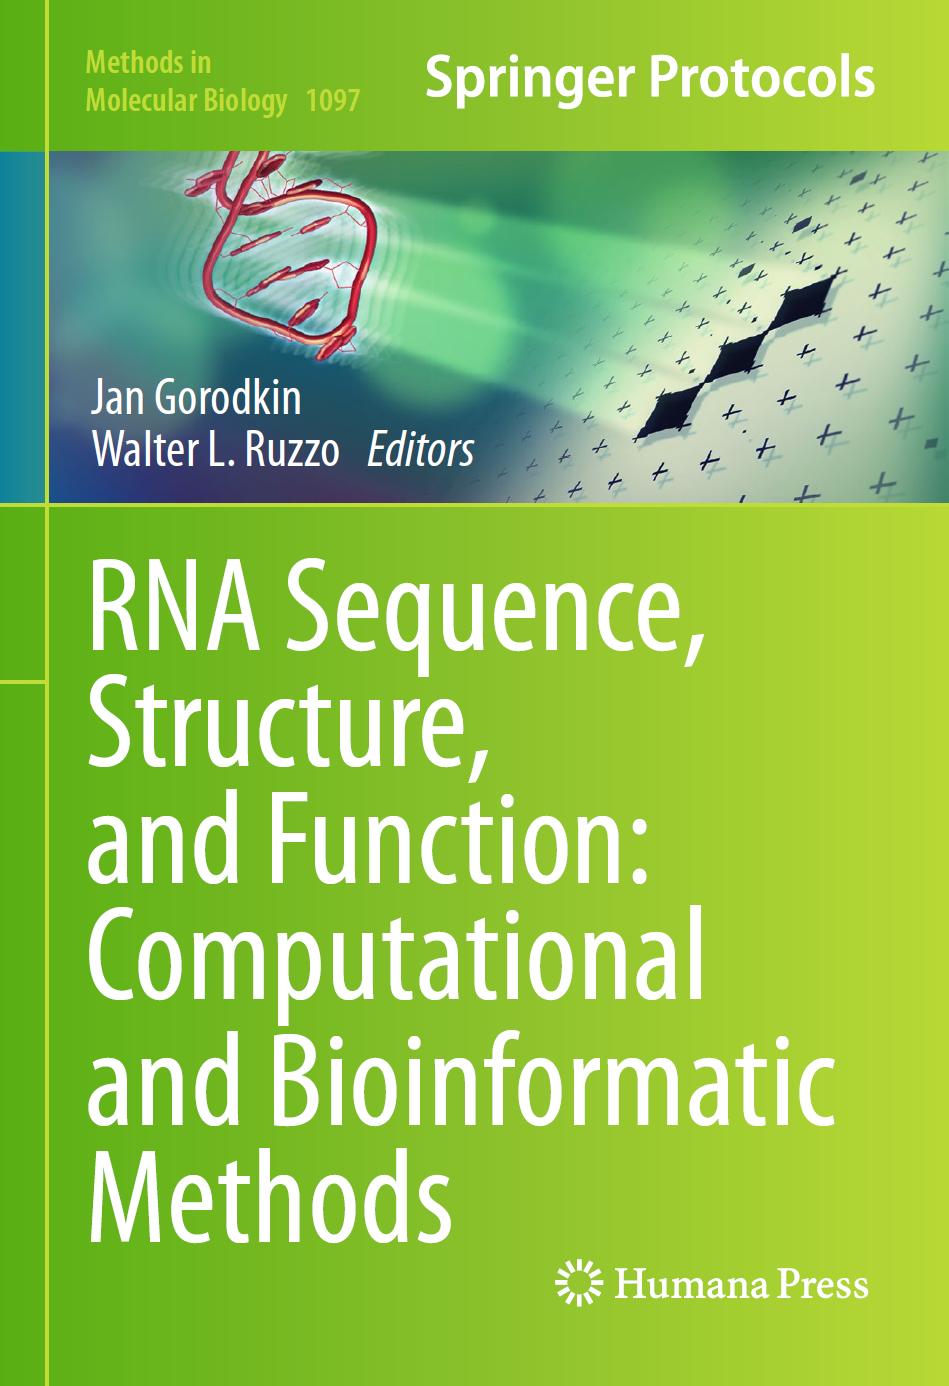 rna book cover